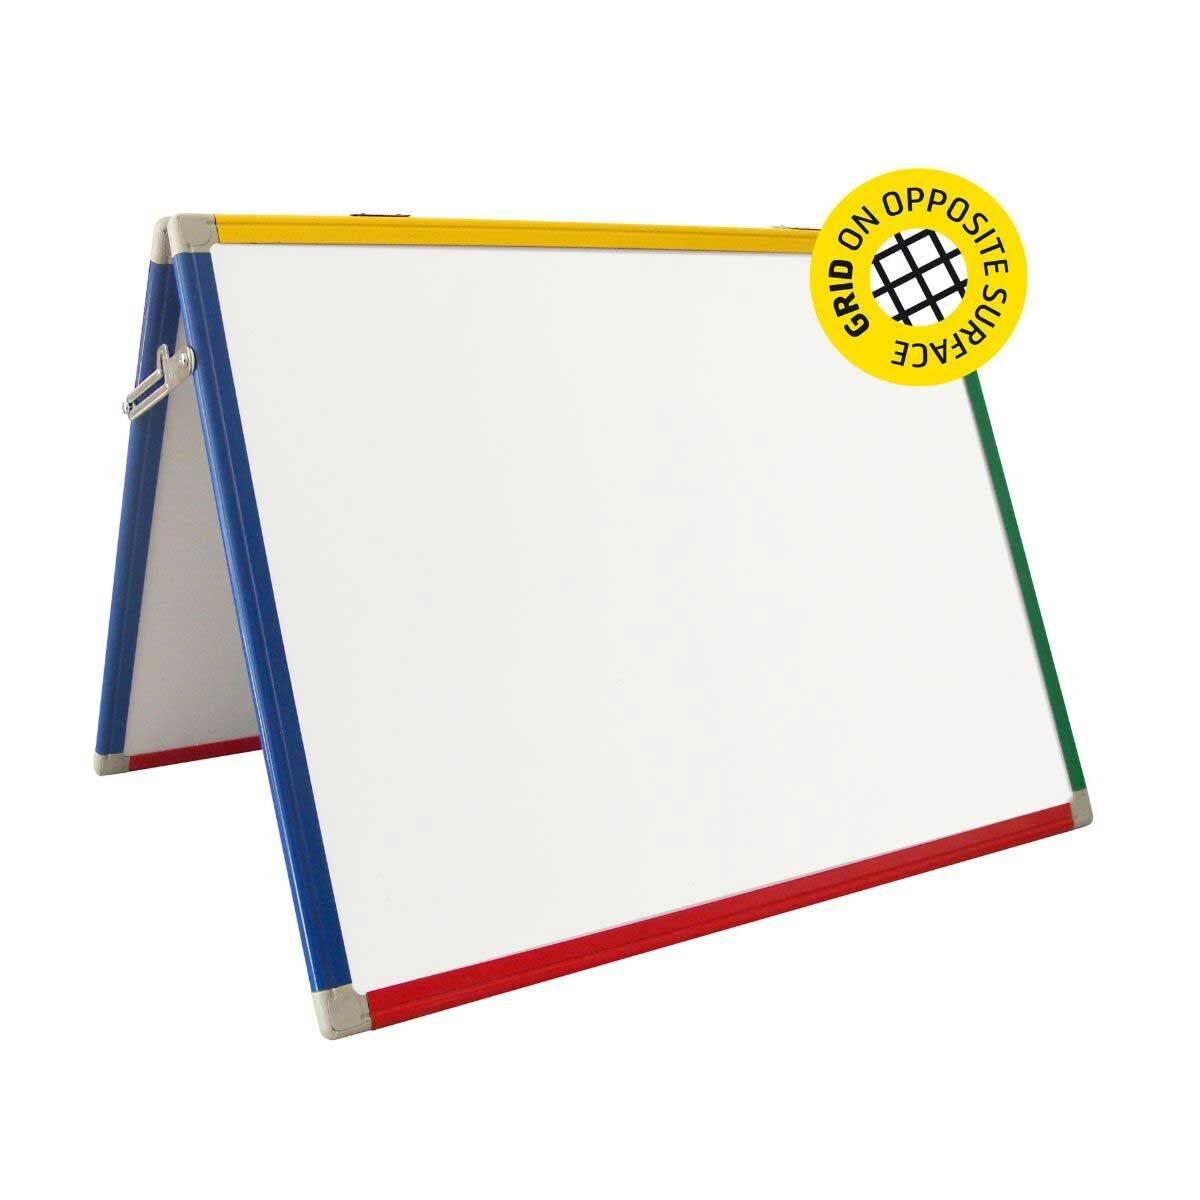 Desktop Easel, Dry Erase and Magnetic 600x405mm